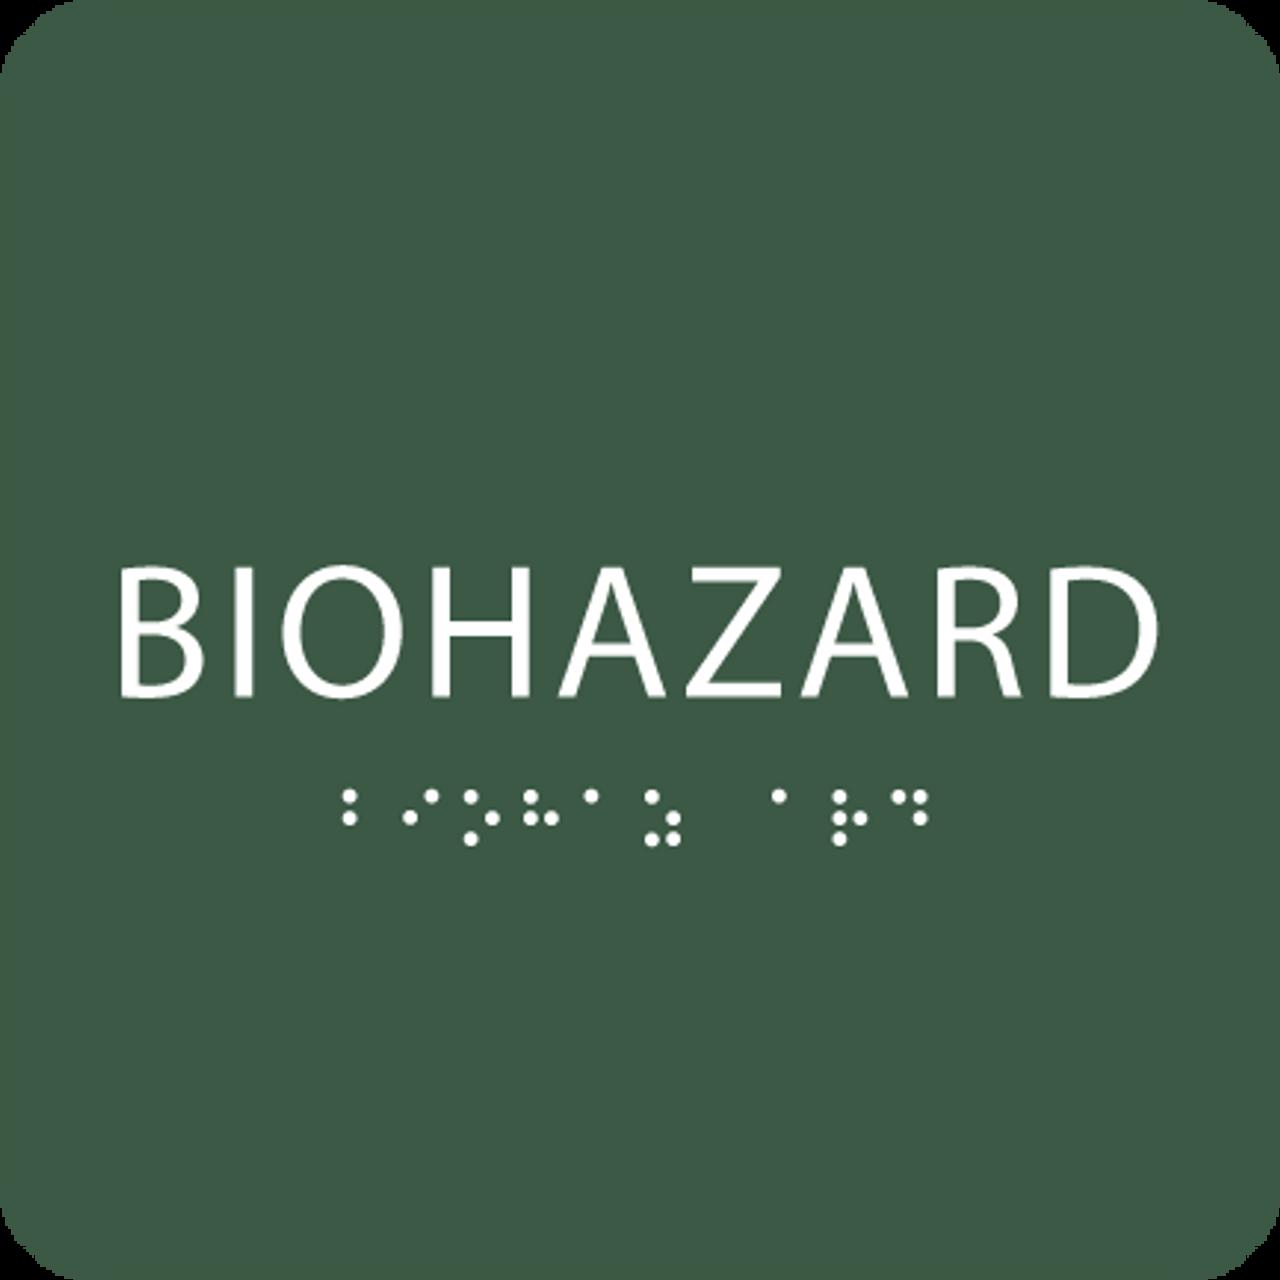 Green Biohazard Tactile Sign